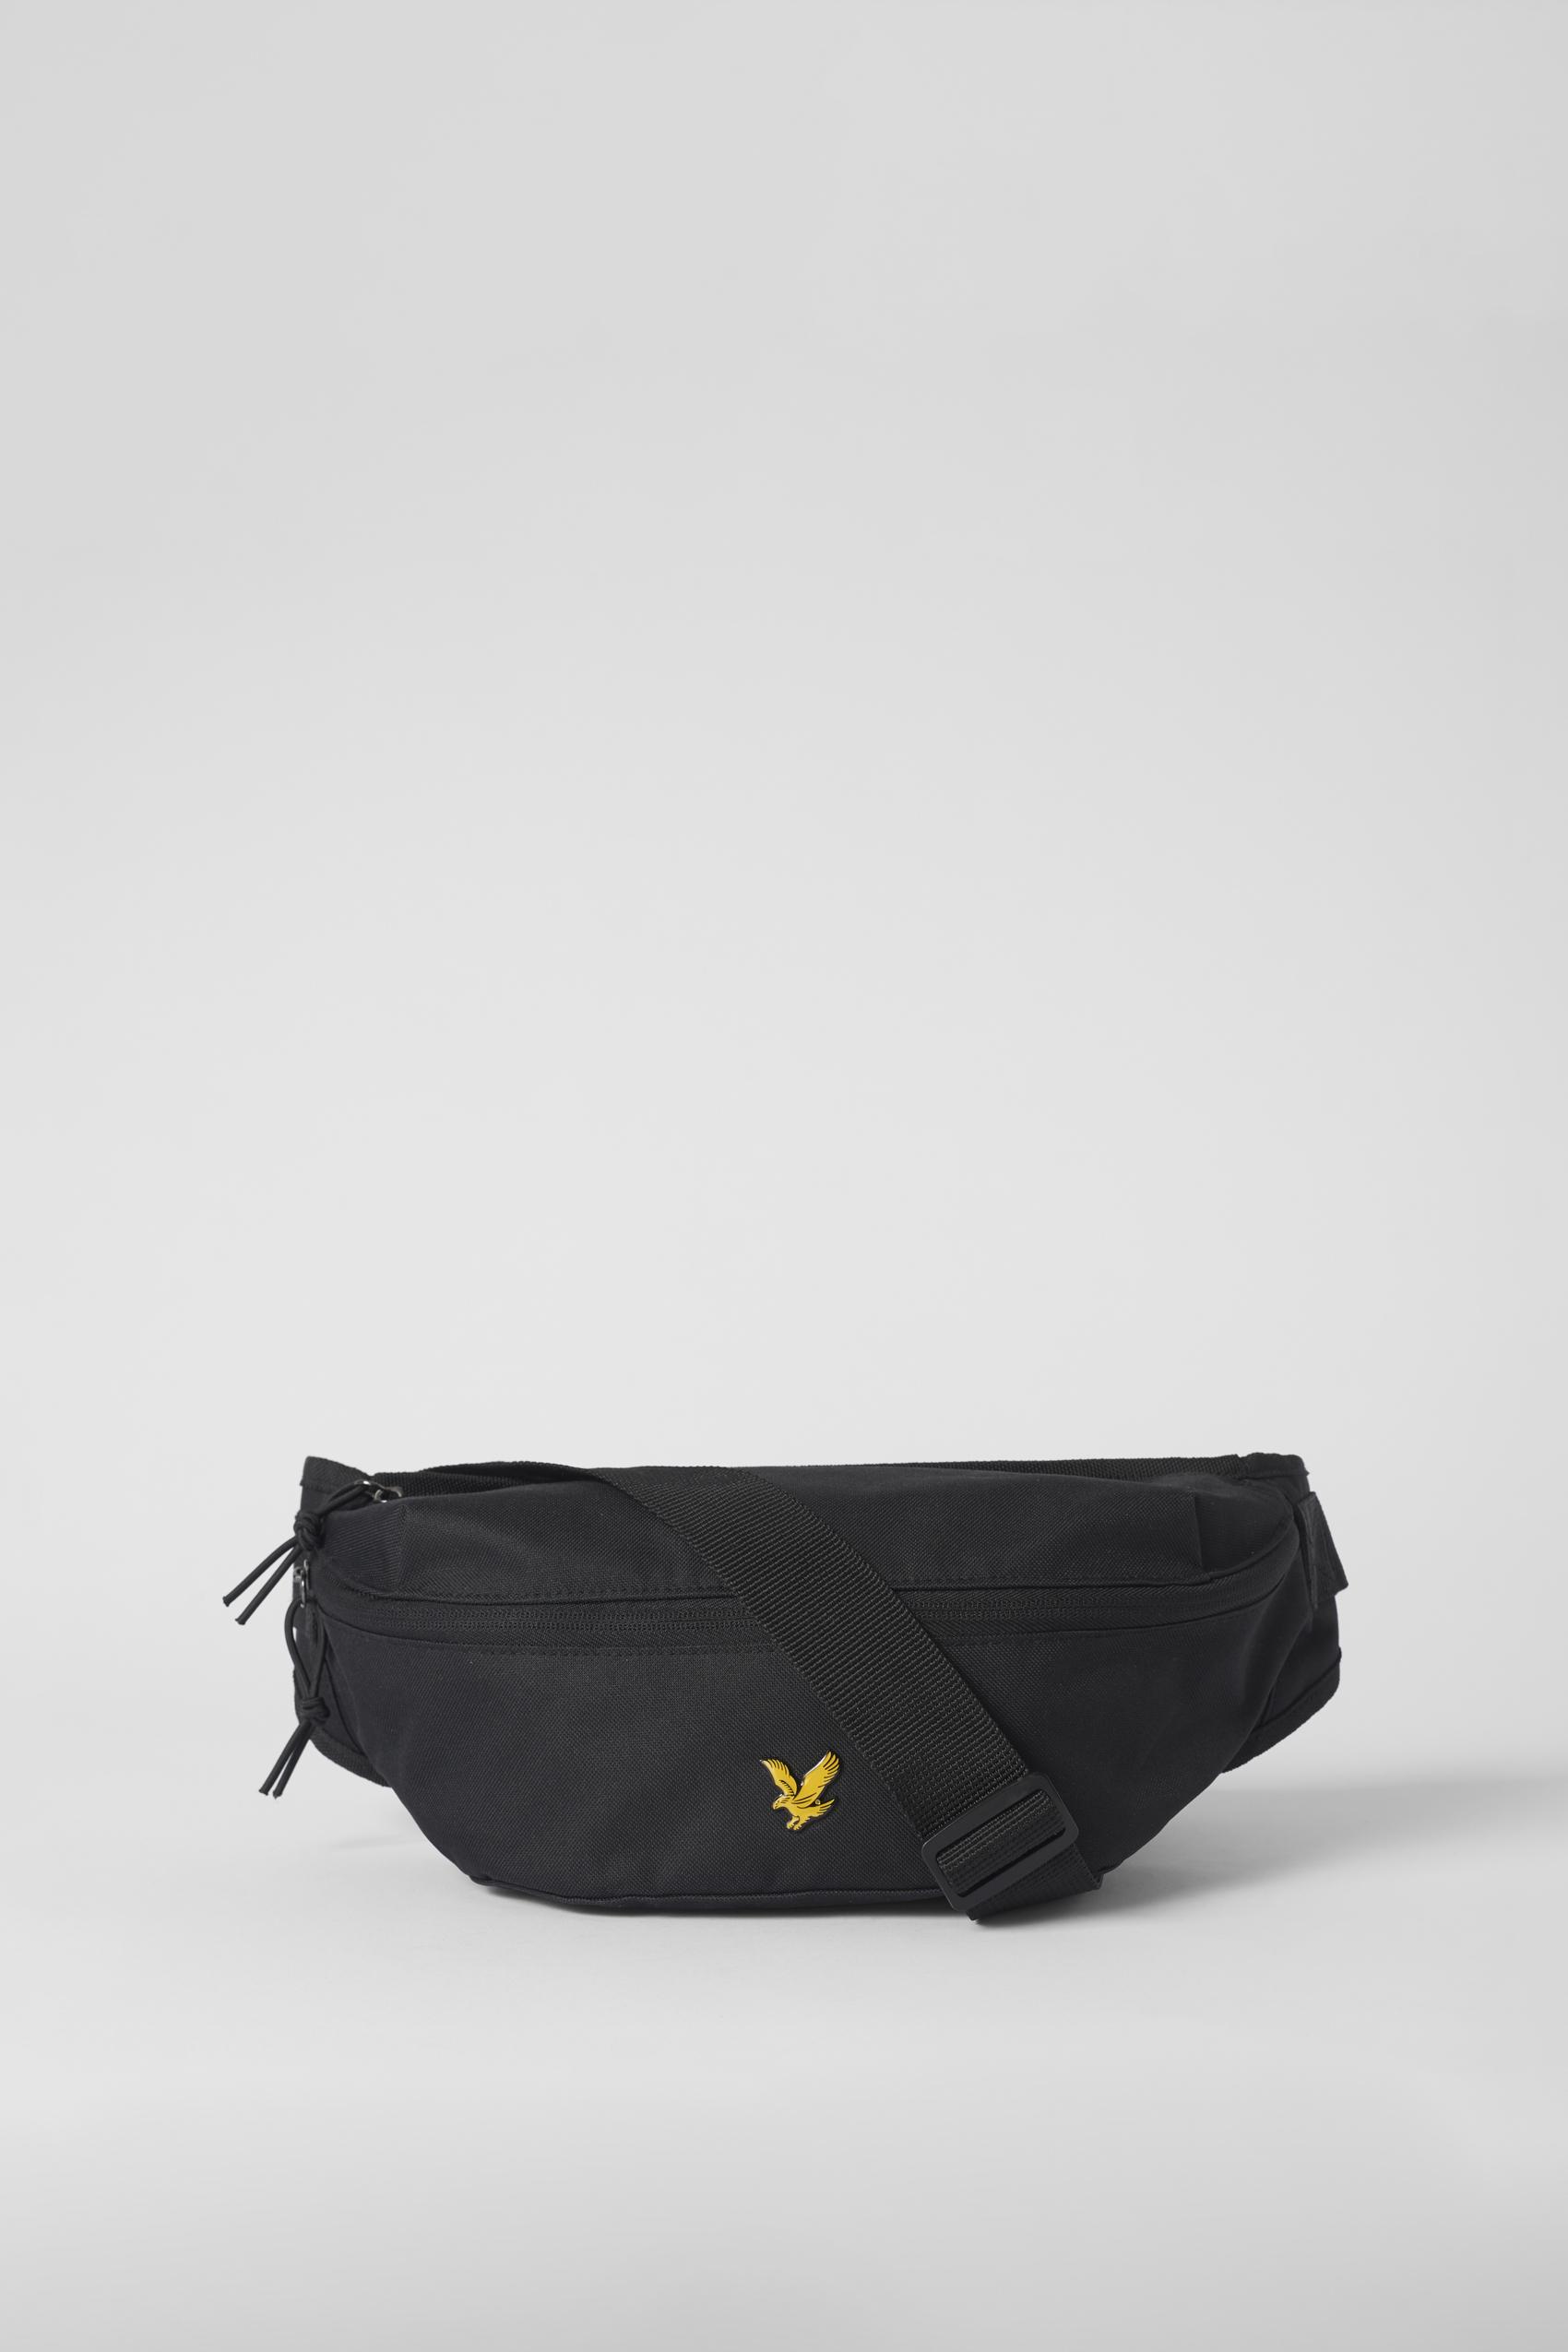 Cross body sling